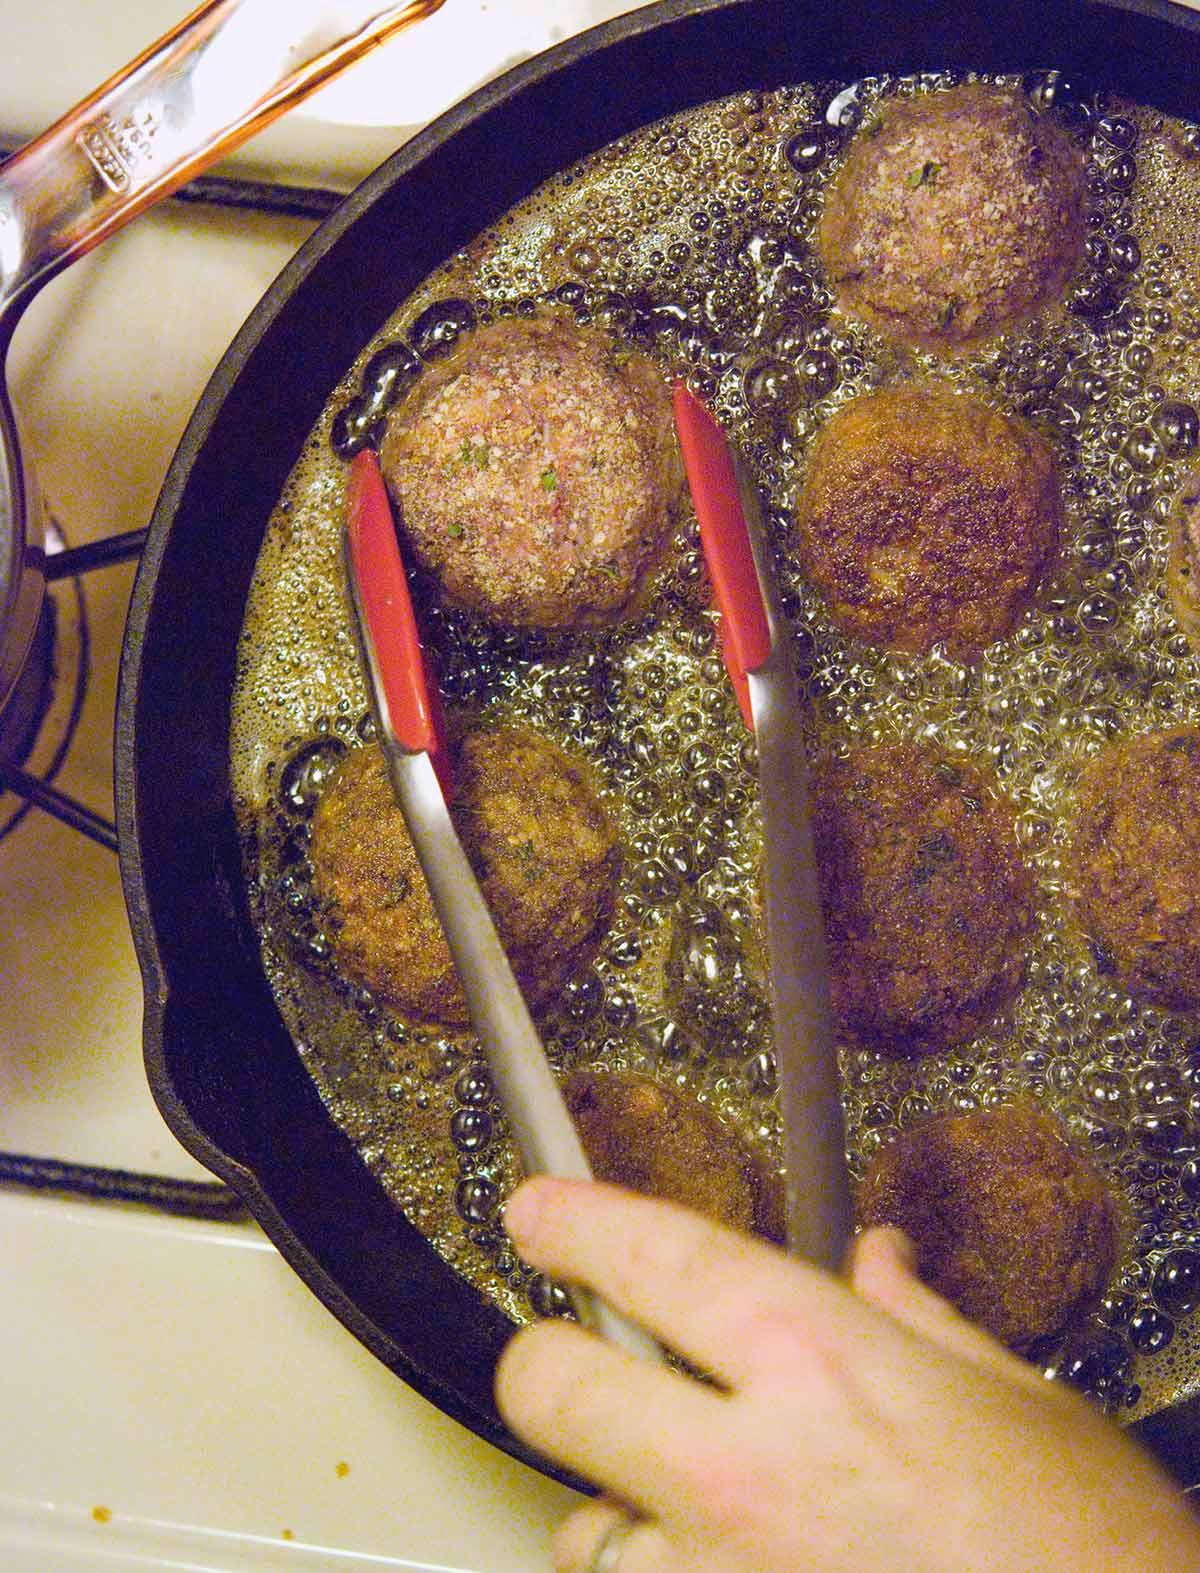 Frying venison meatballs